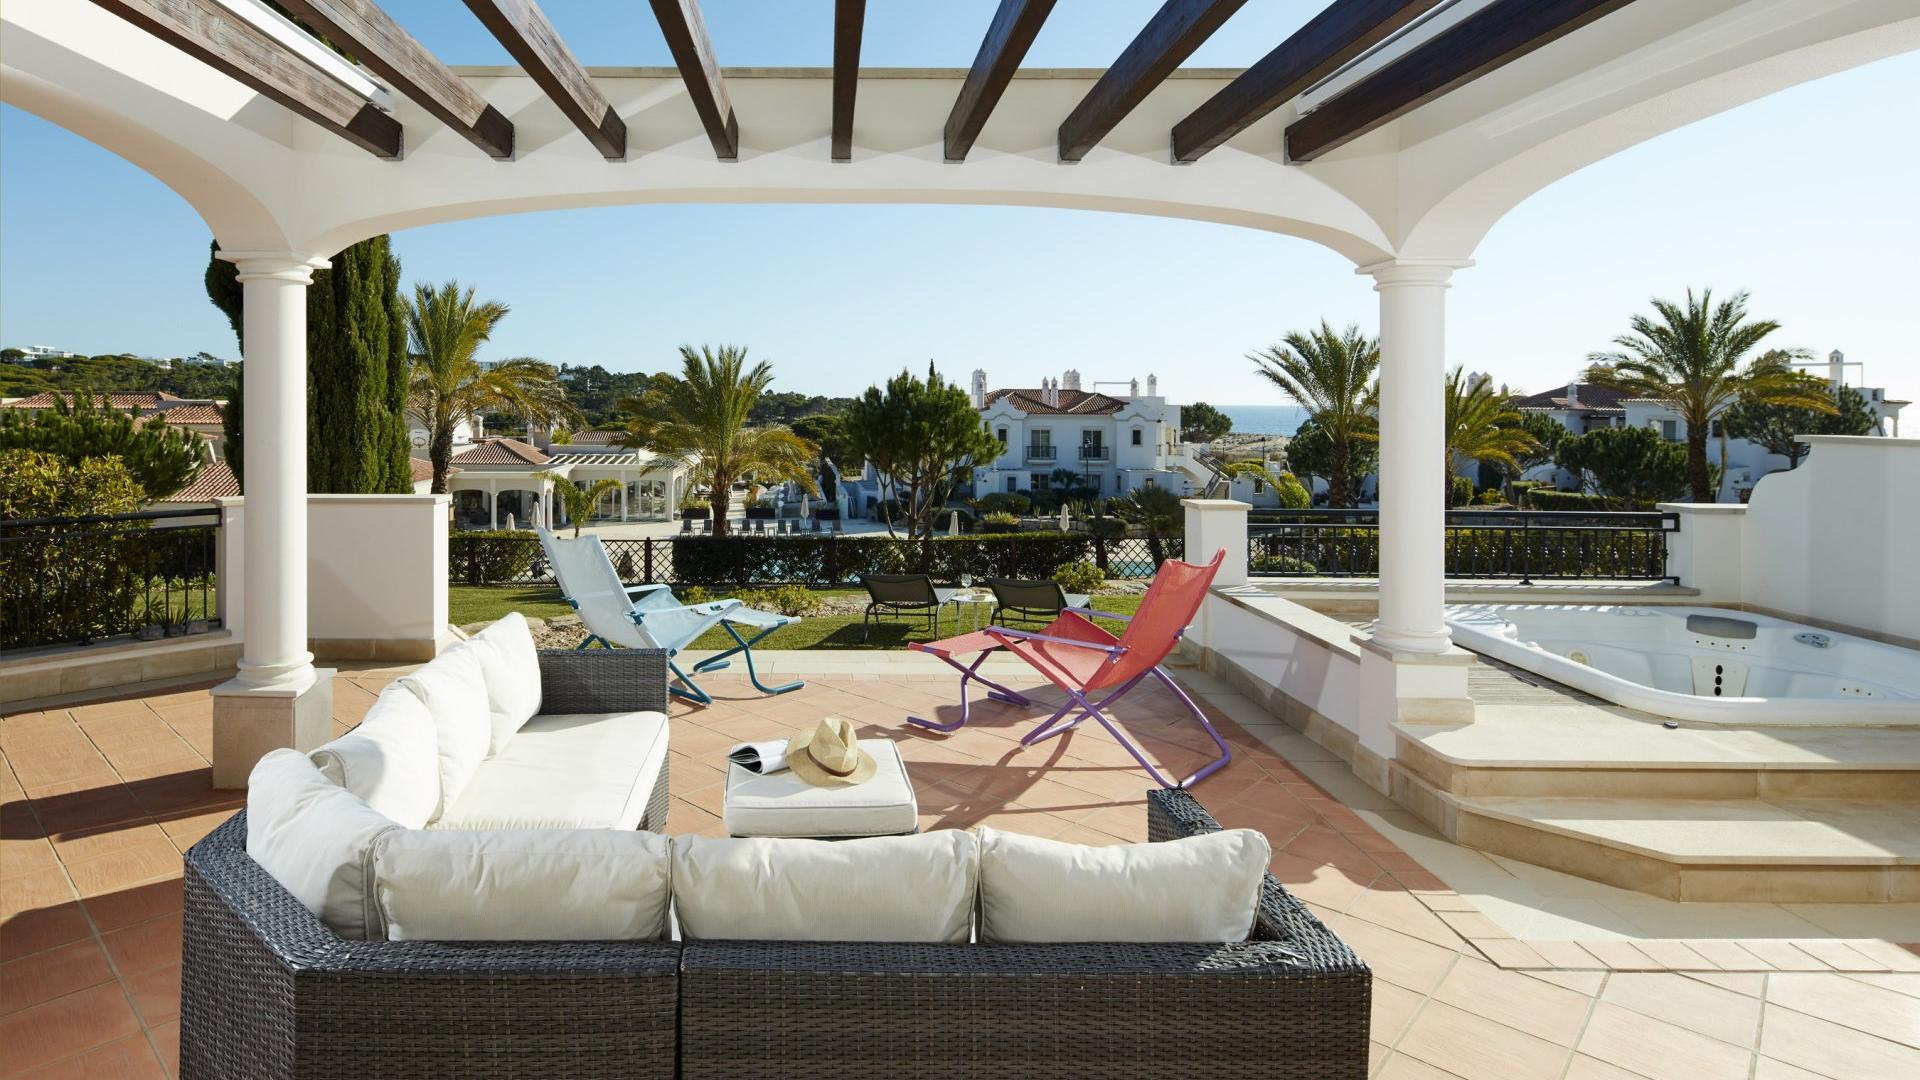 Dunas Douradas Beach Club Partial Sea View 3 bedroom Whirlpool Apartment - Dunas Douradas Beach Club, Vale do Lobo, Algarve - DDBC_X3A2597RN.jpg